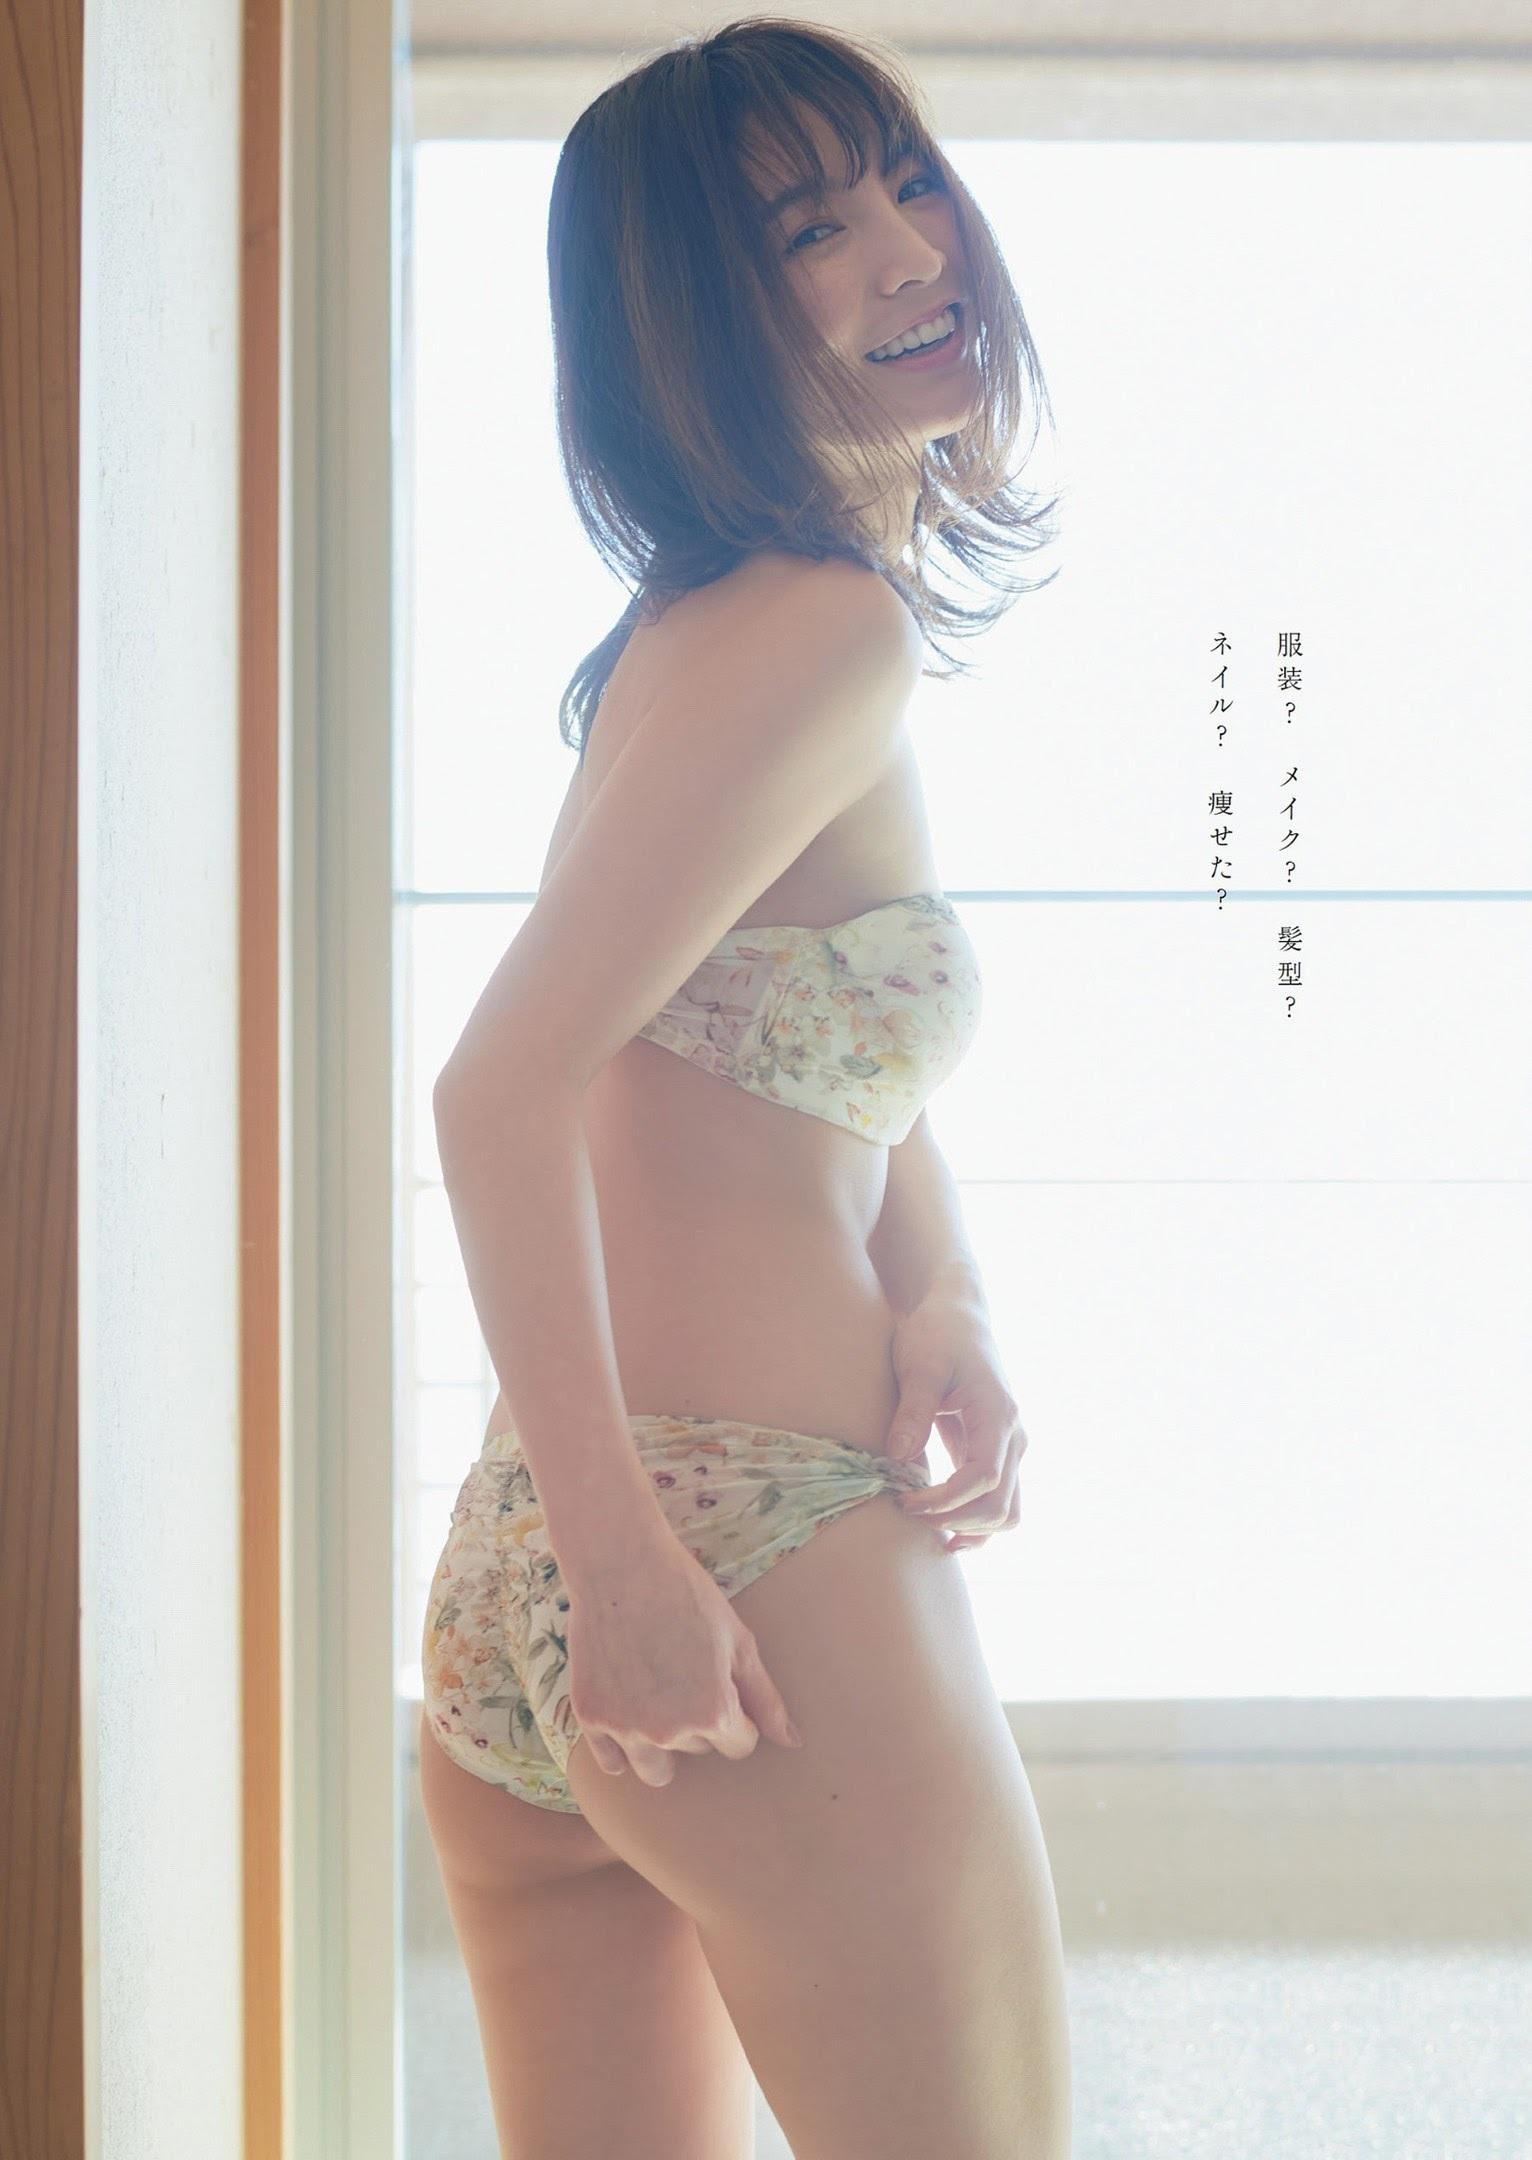 小山璃奈 頓知気さきな 伊藤美来-Weekly Playboy 2021年第十八期 高清套图 第58张